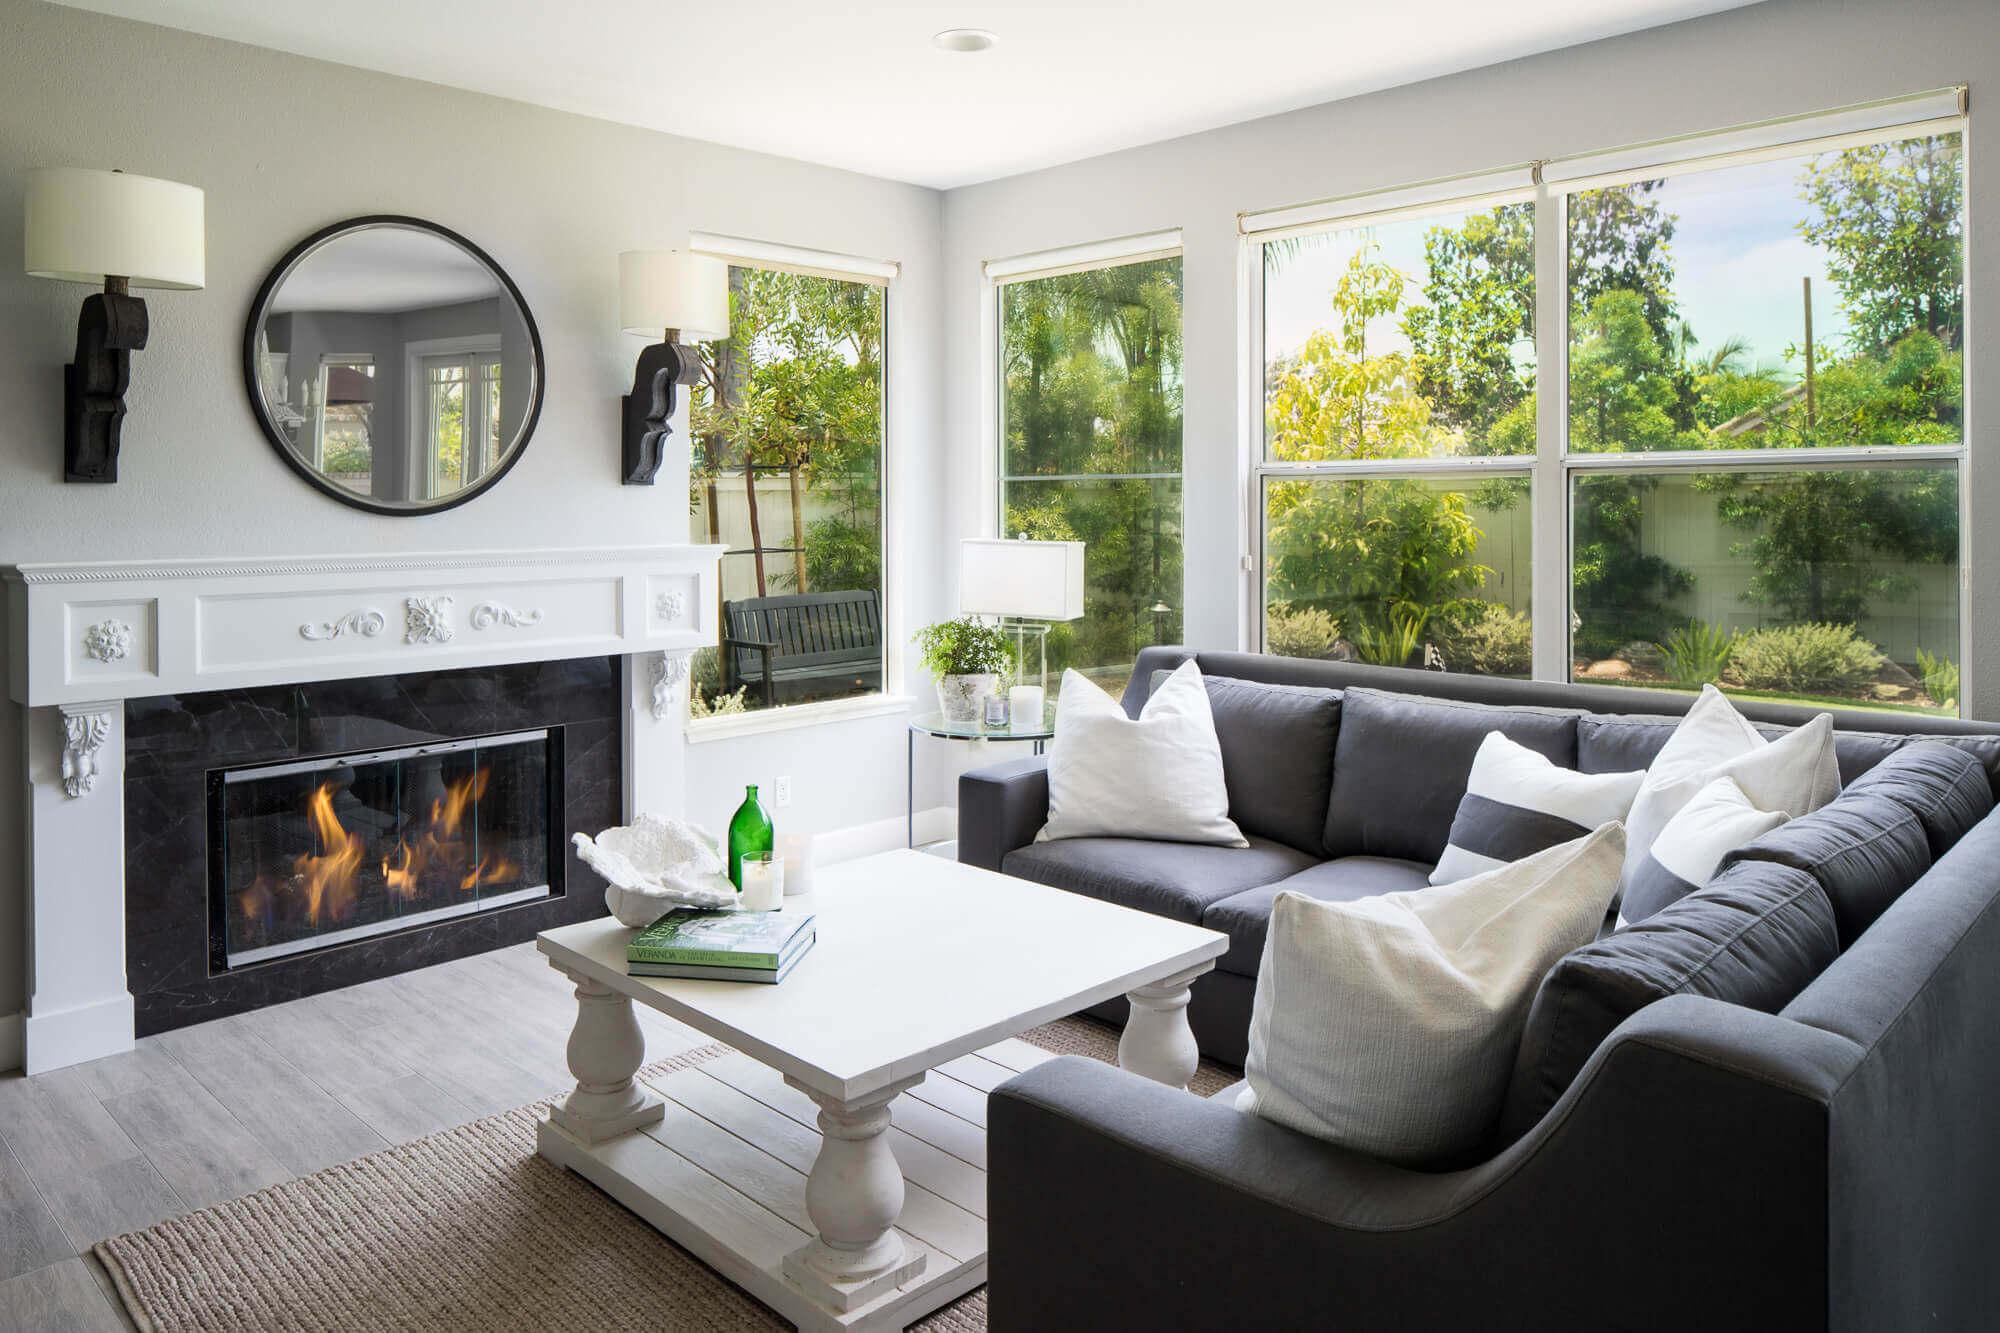 Your living room lighting plan